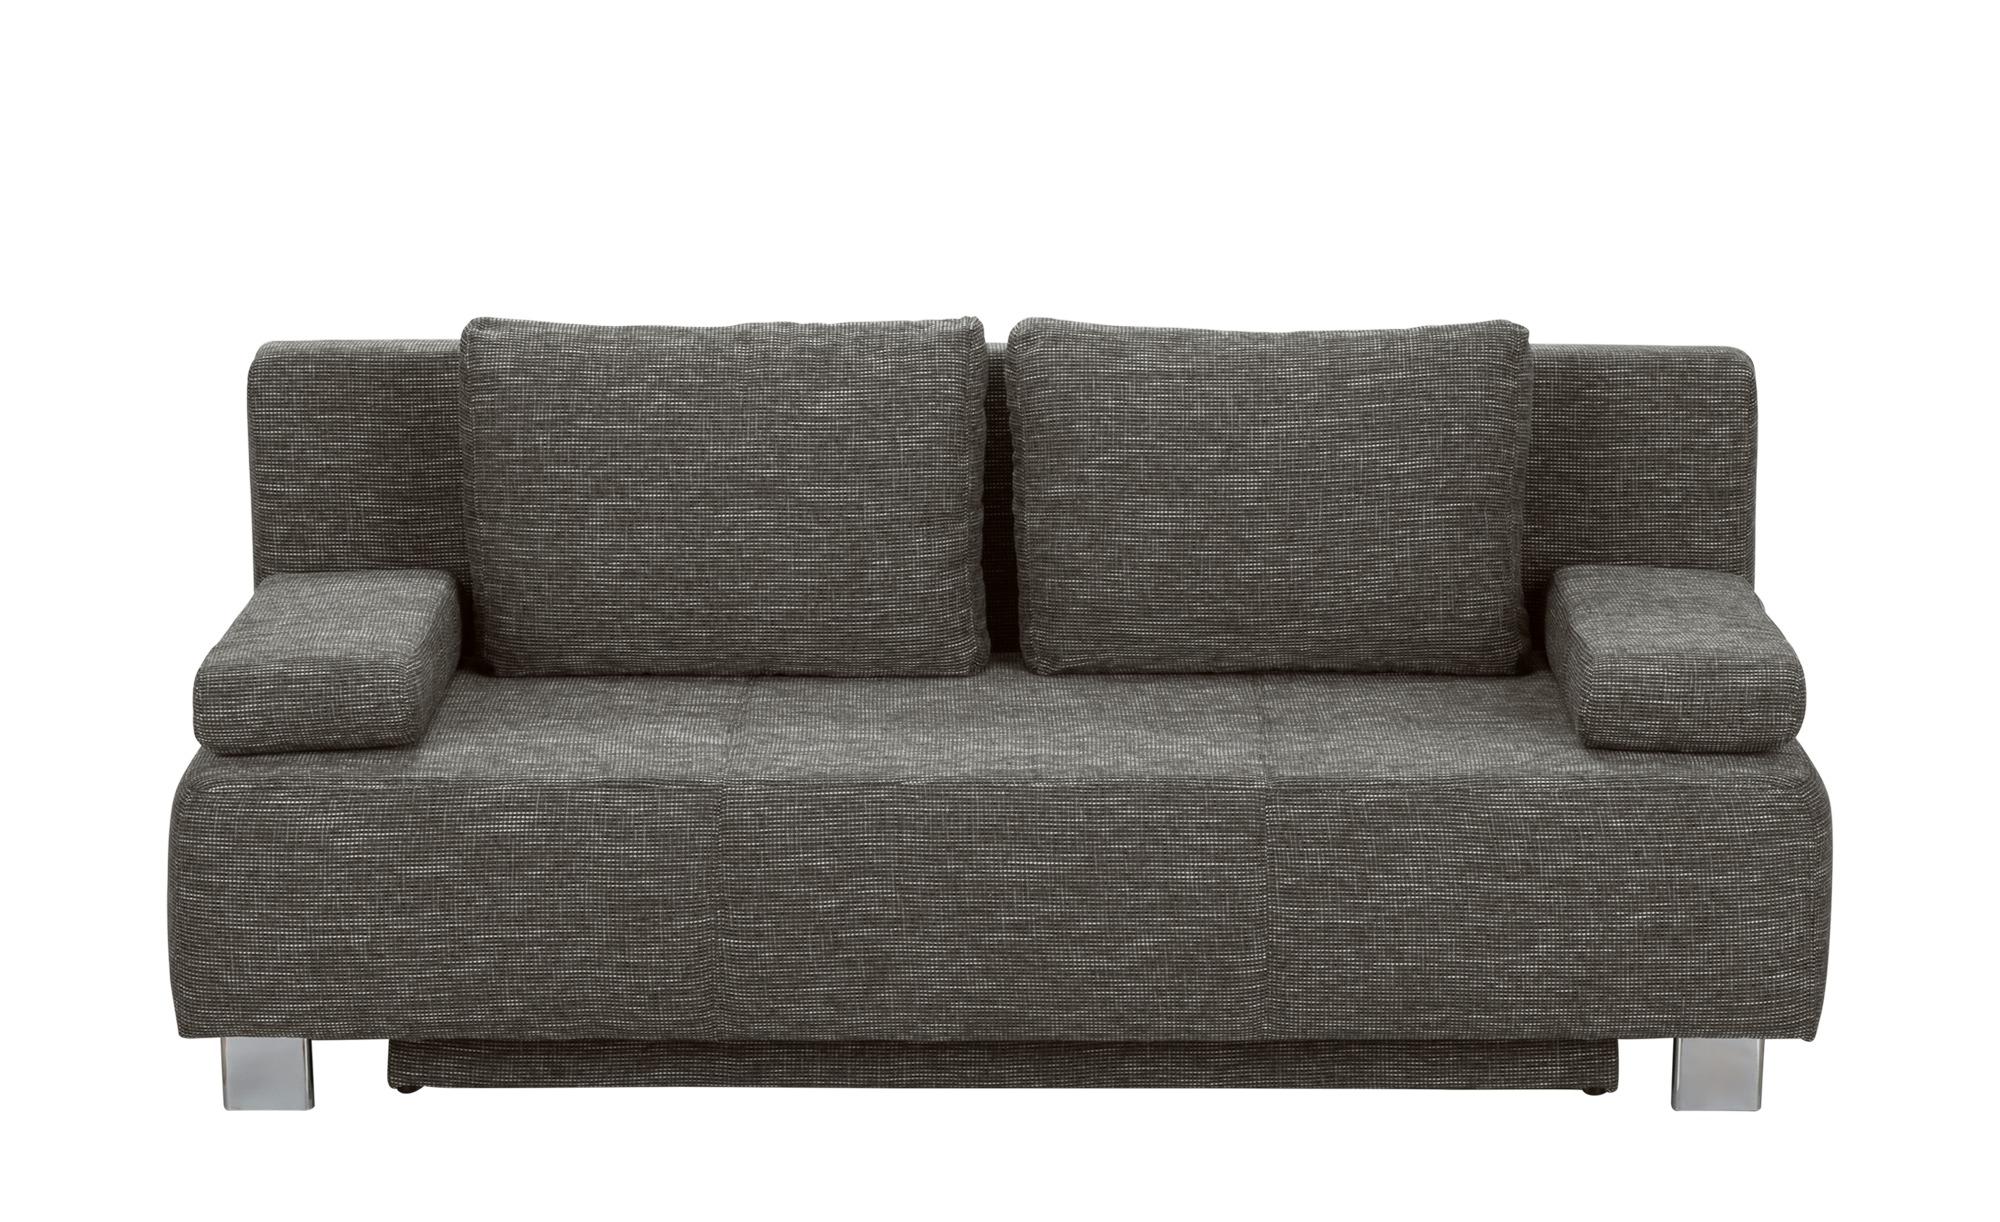 Schlafcouch grau - Webstoff Donald ¦ grau ¦ Maße (cm): B: 197 H: 88 T: 89 Polstermöbel > Sofas > 2-Sitzer - Höffner